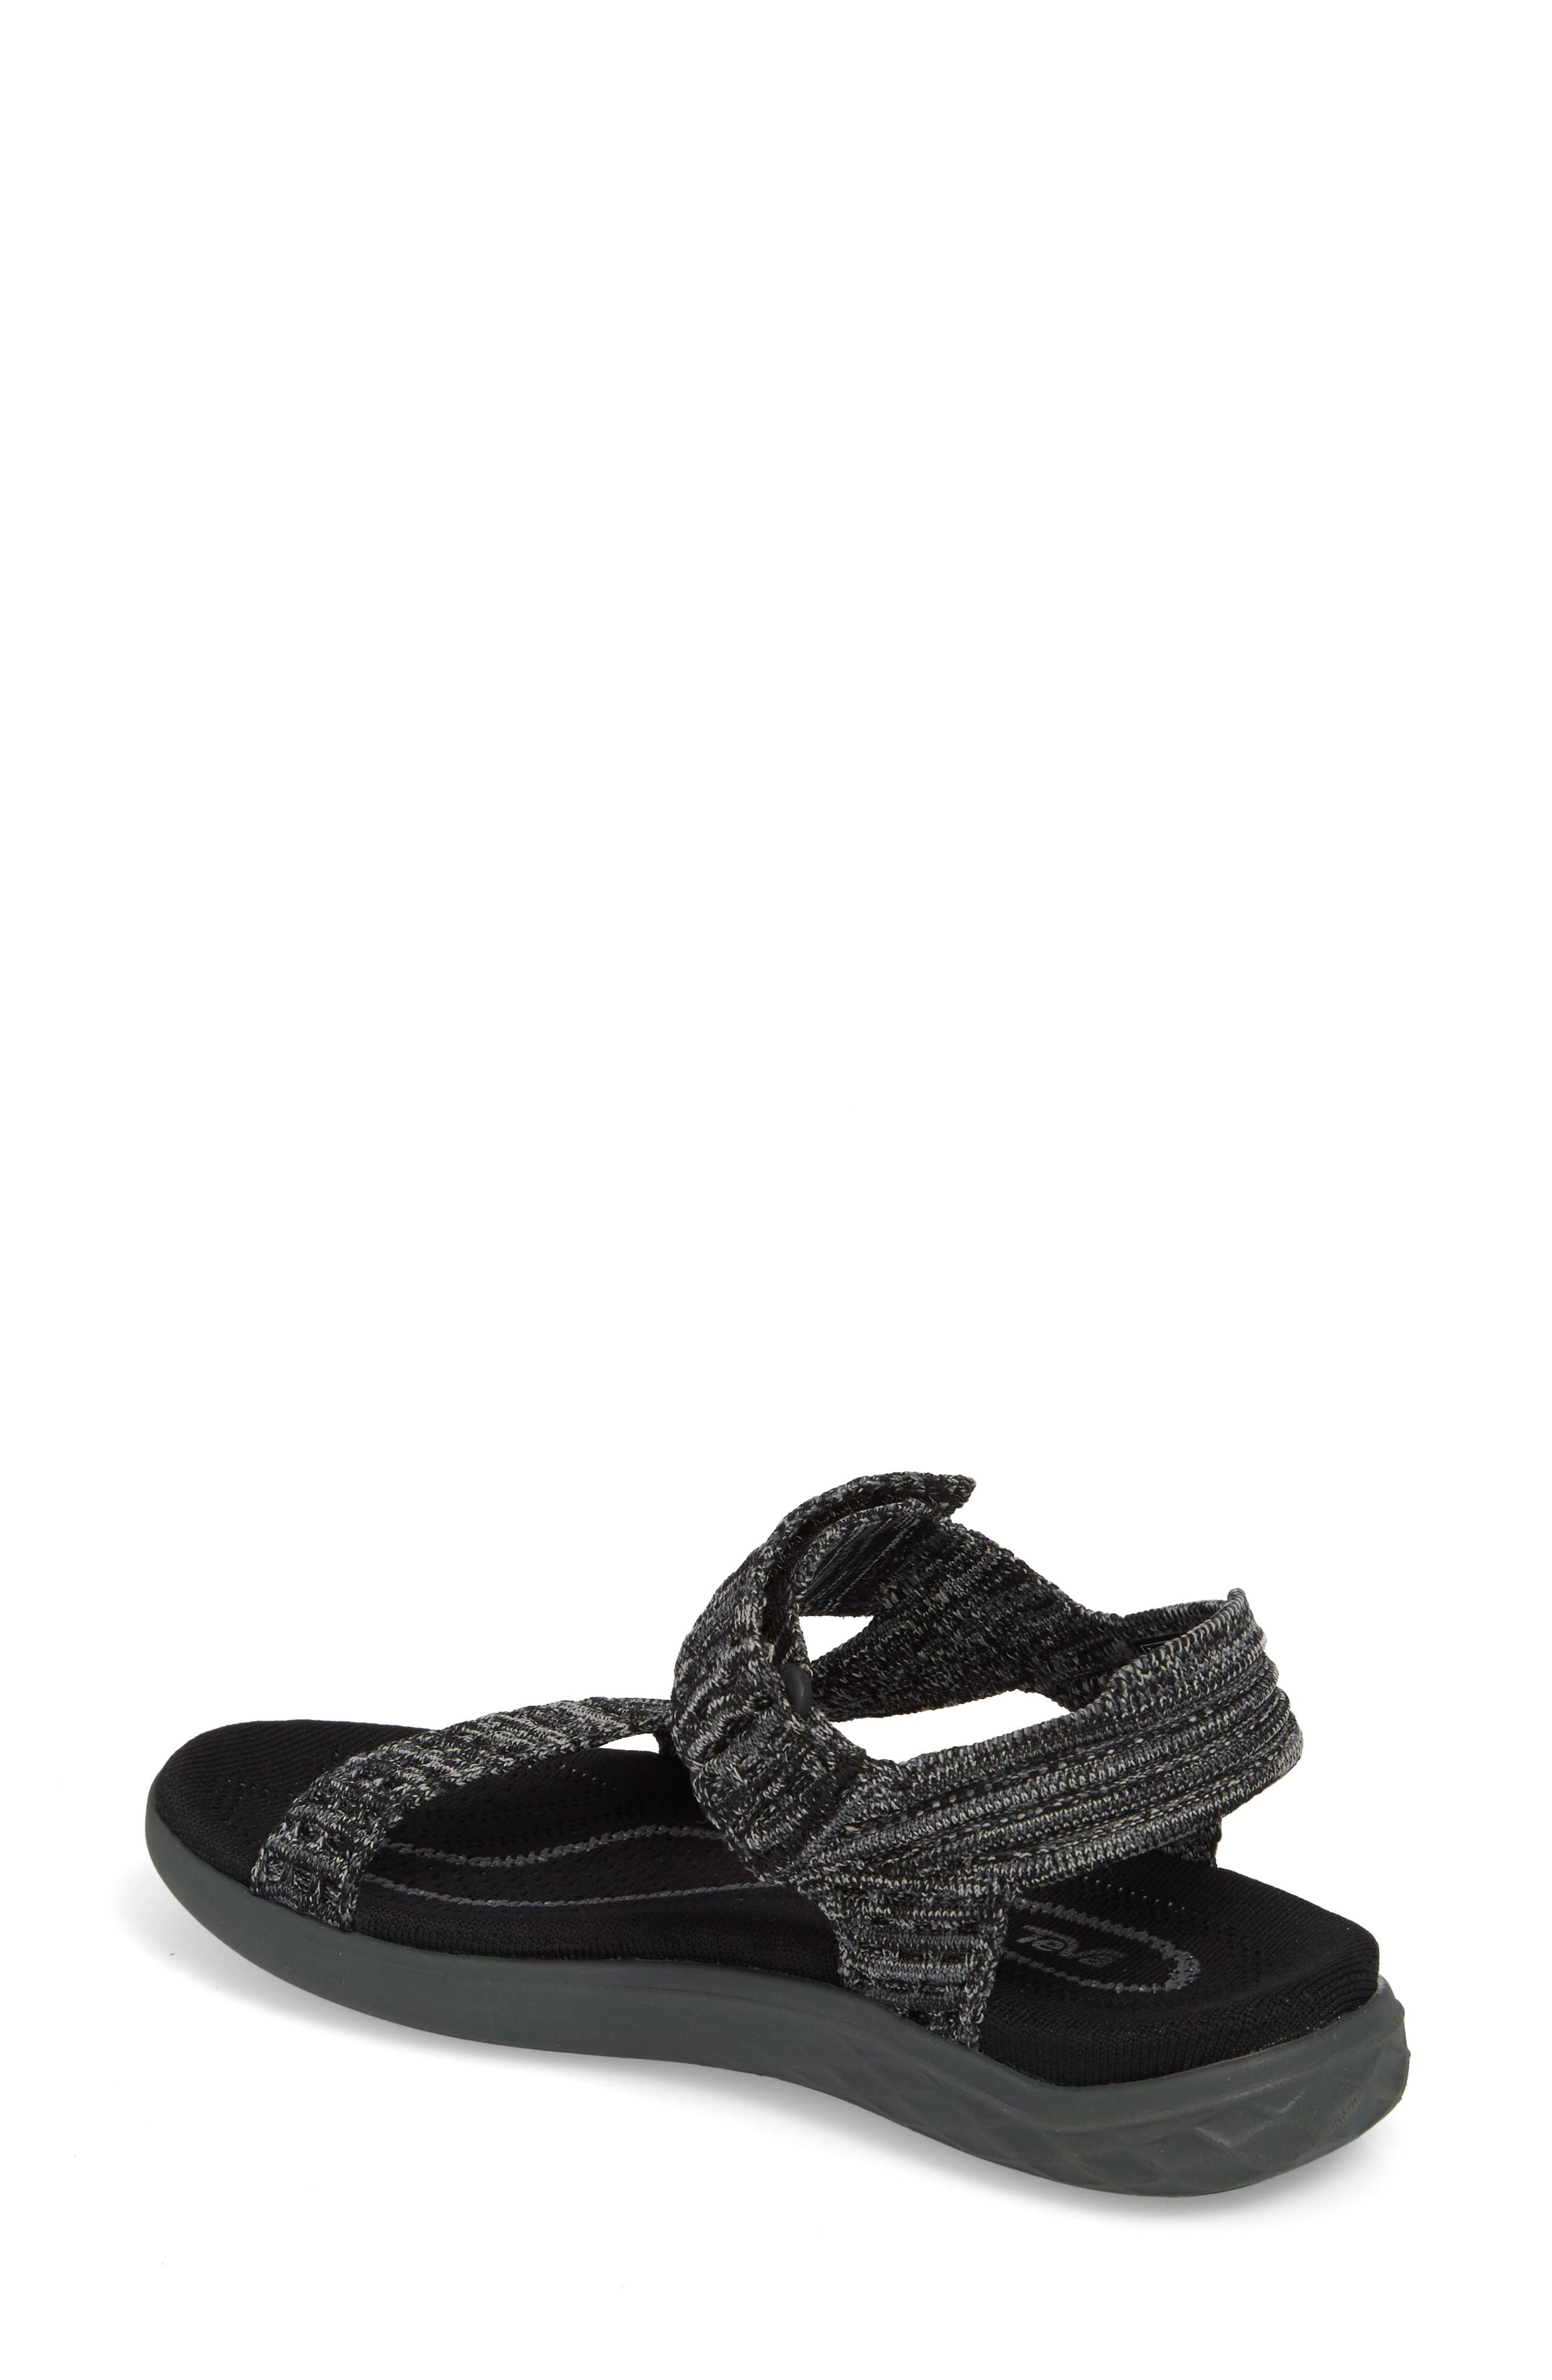 Terra Float 2 Knit Universal Sandal,                             Alternate thumbnail 5, color,